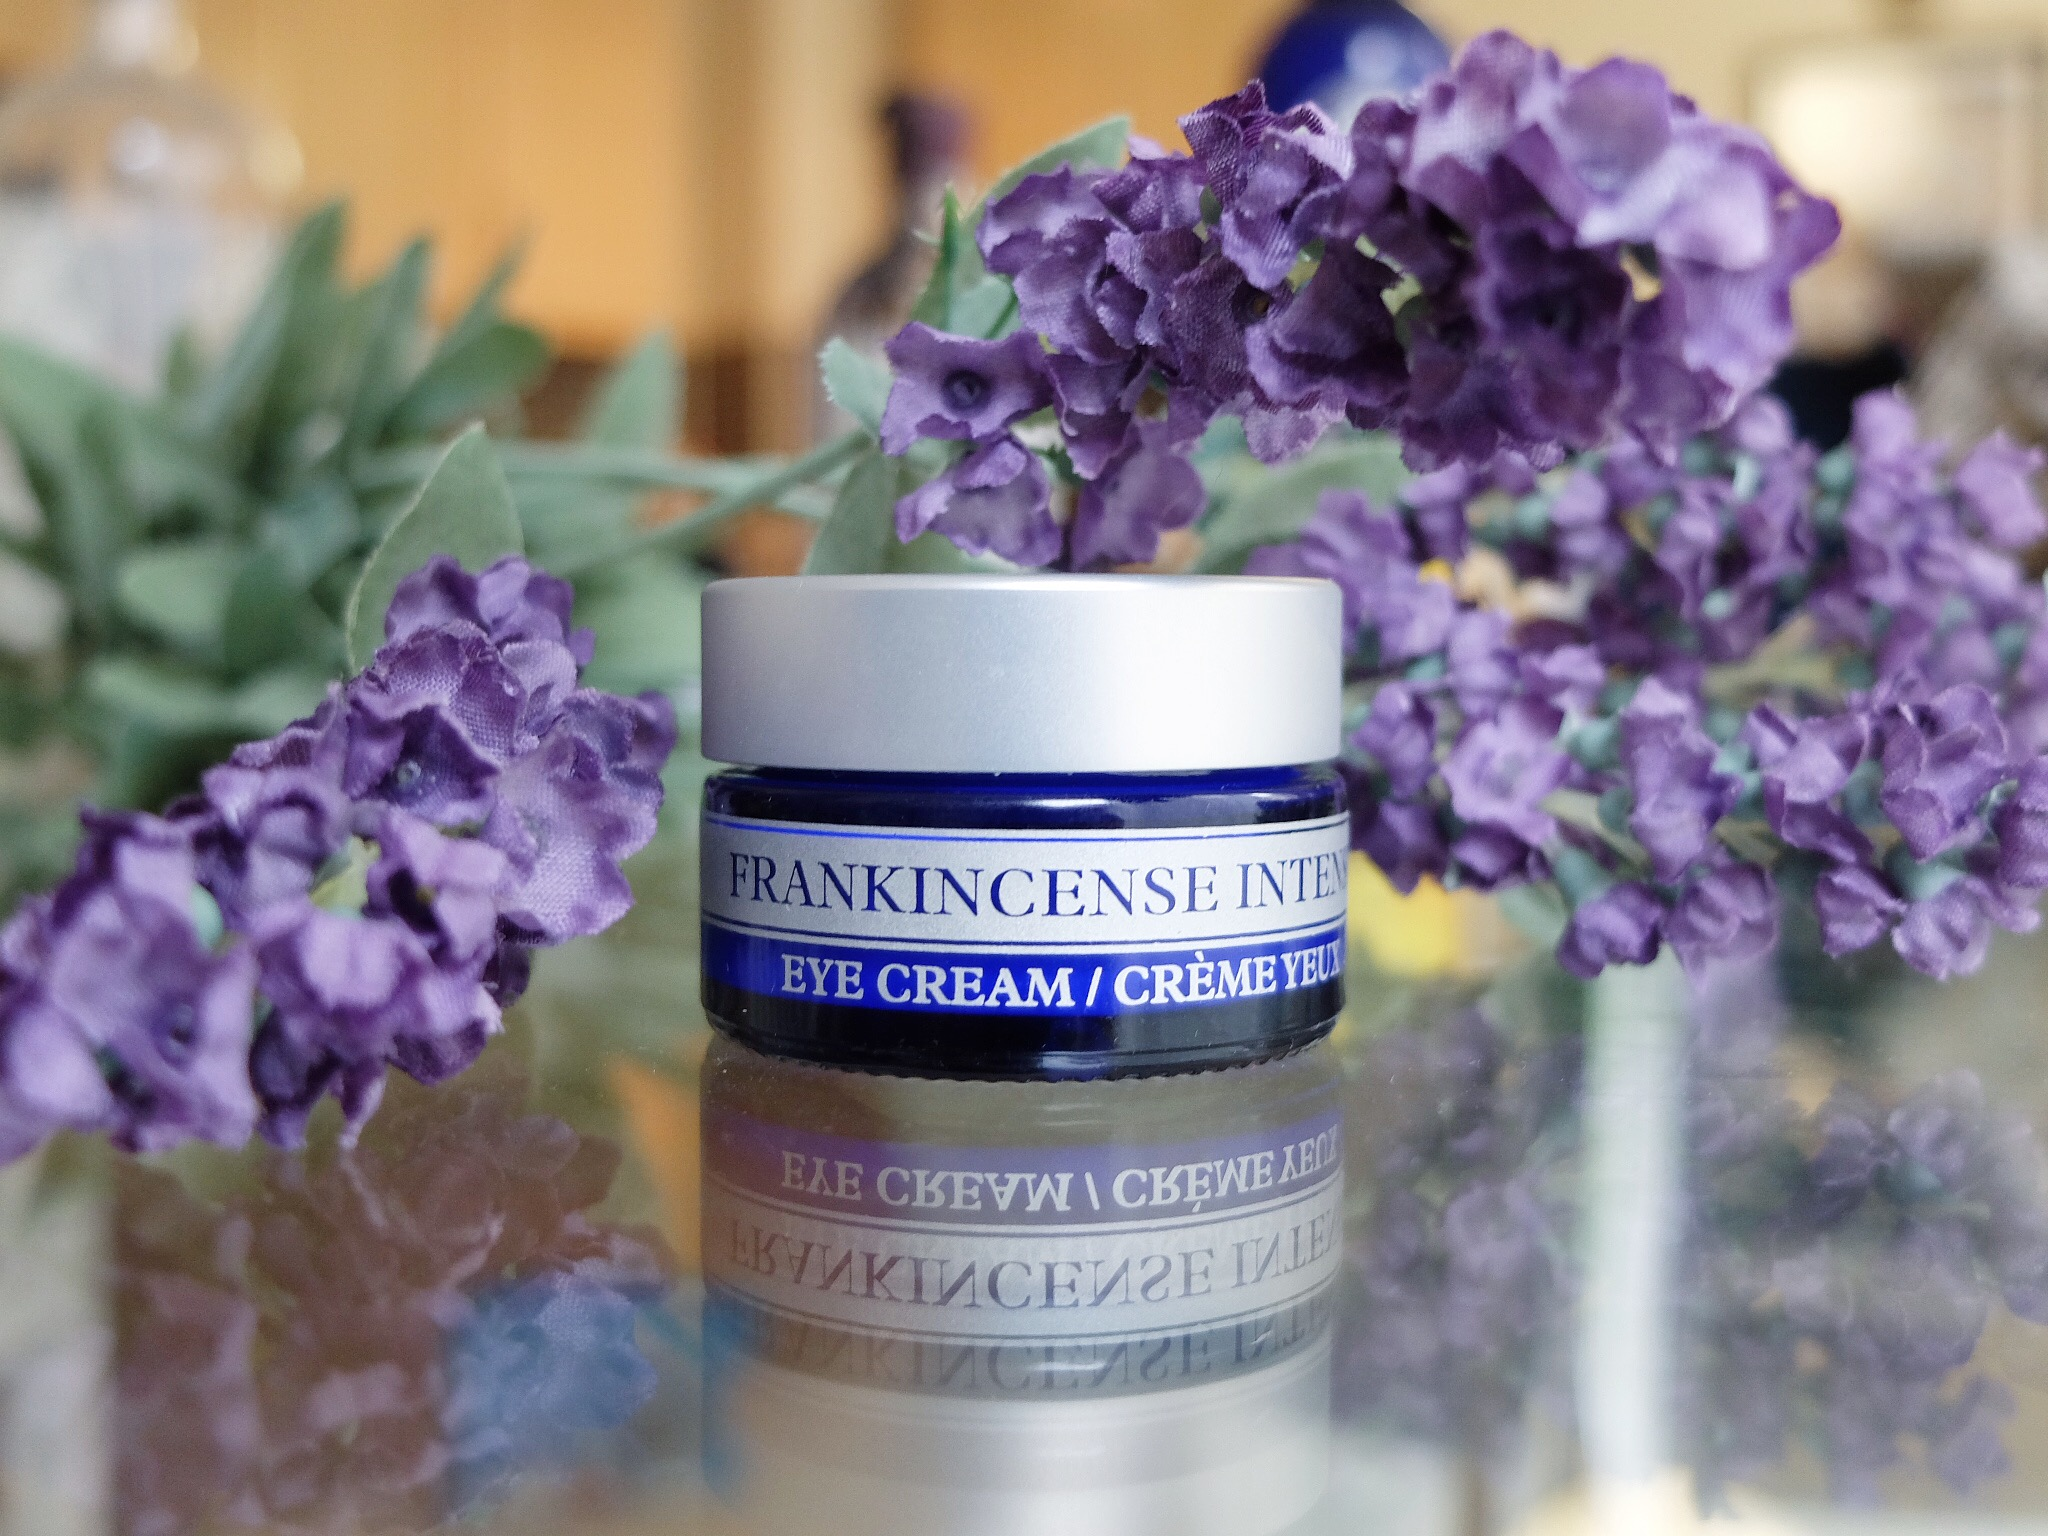 neals_yard_frankincense_eye_cream_review